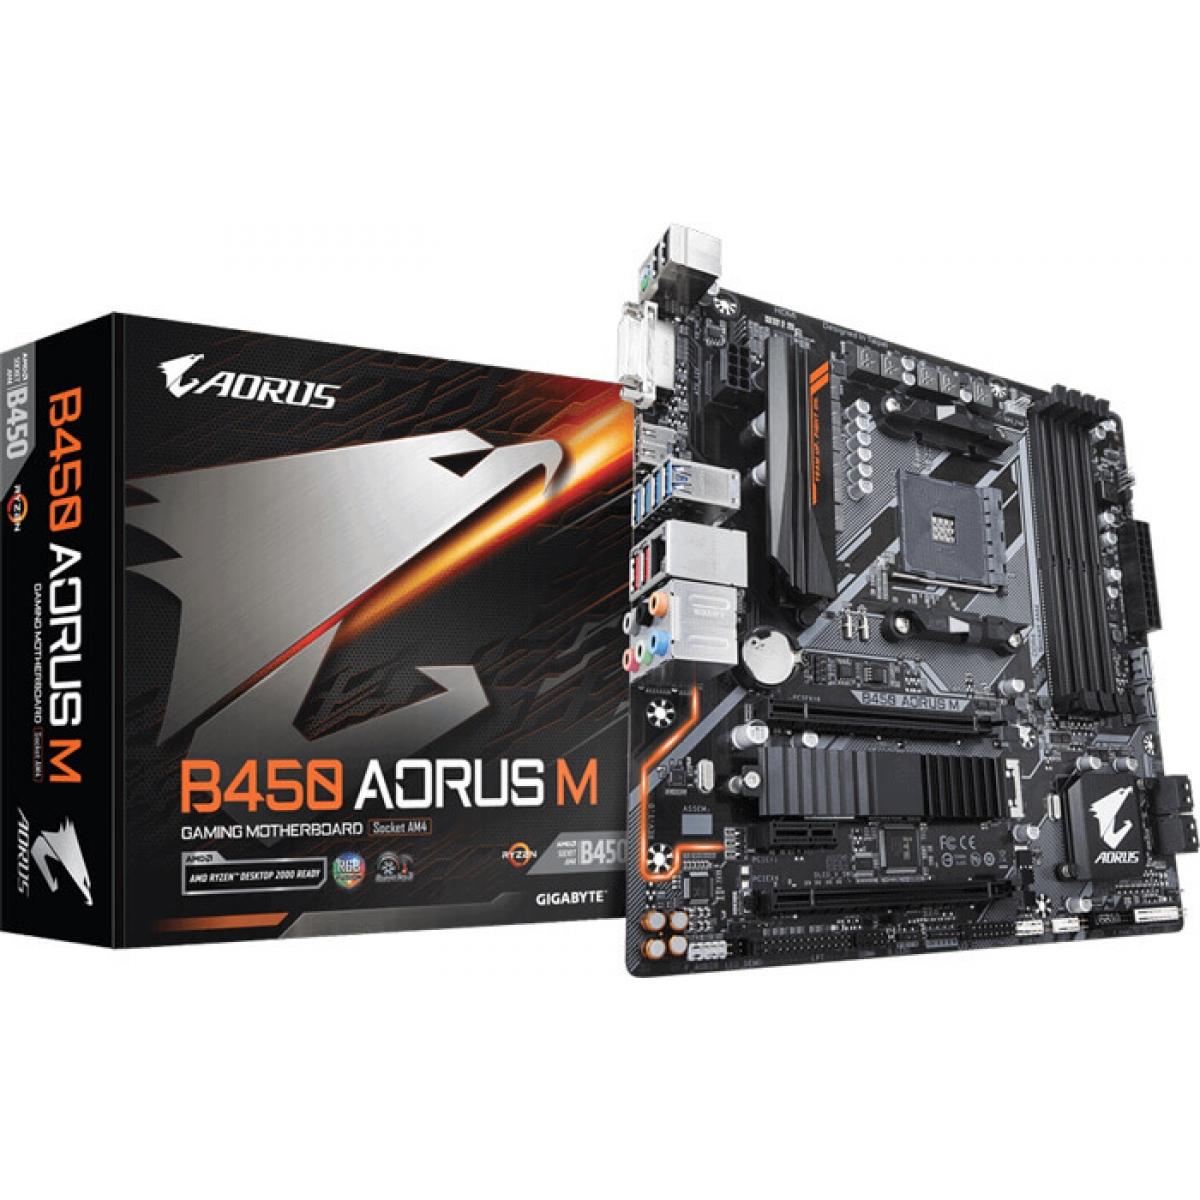 Placa Mãe Gigabyte B450 AORUS M, Chipset B450, AMD AM4, mATX, DDR4 - Open Box